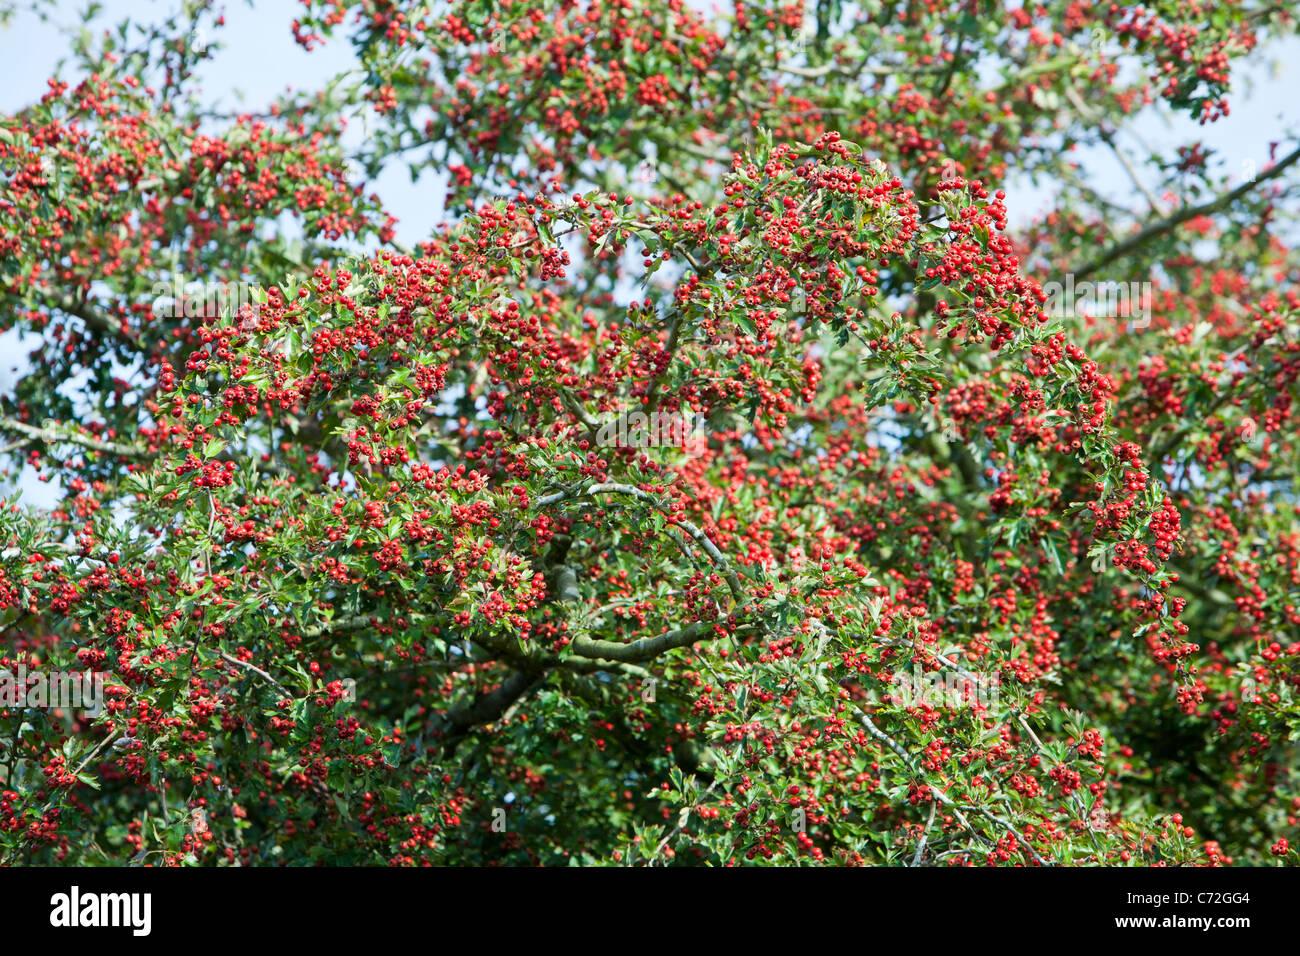 A heavy crop of Hawthorn berries on a Hawthron tree, Norfolk, UK. - Stock Image